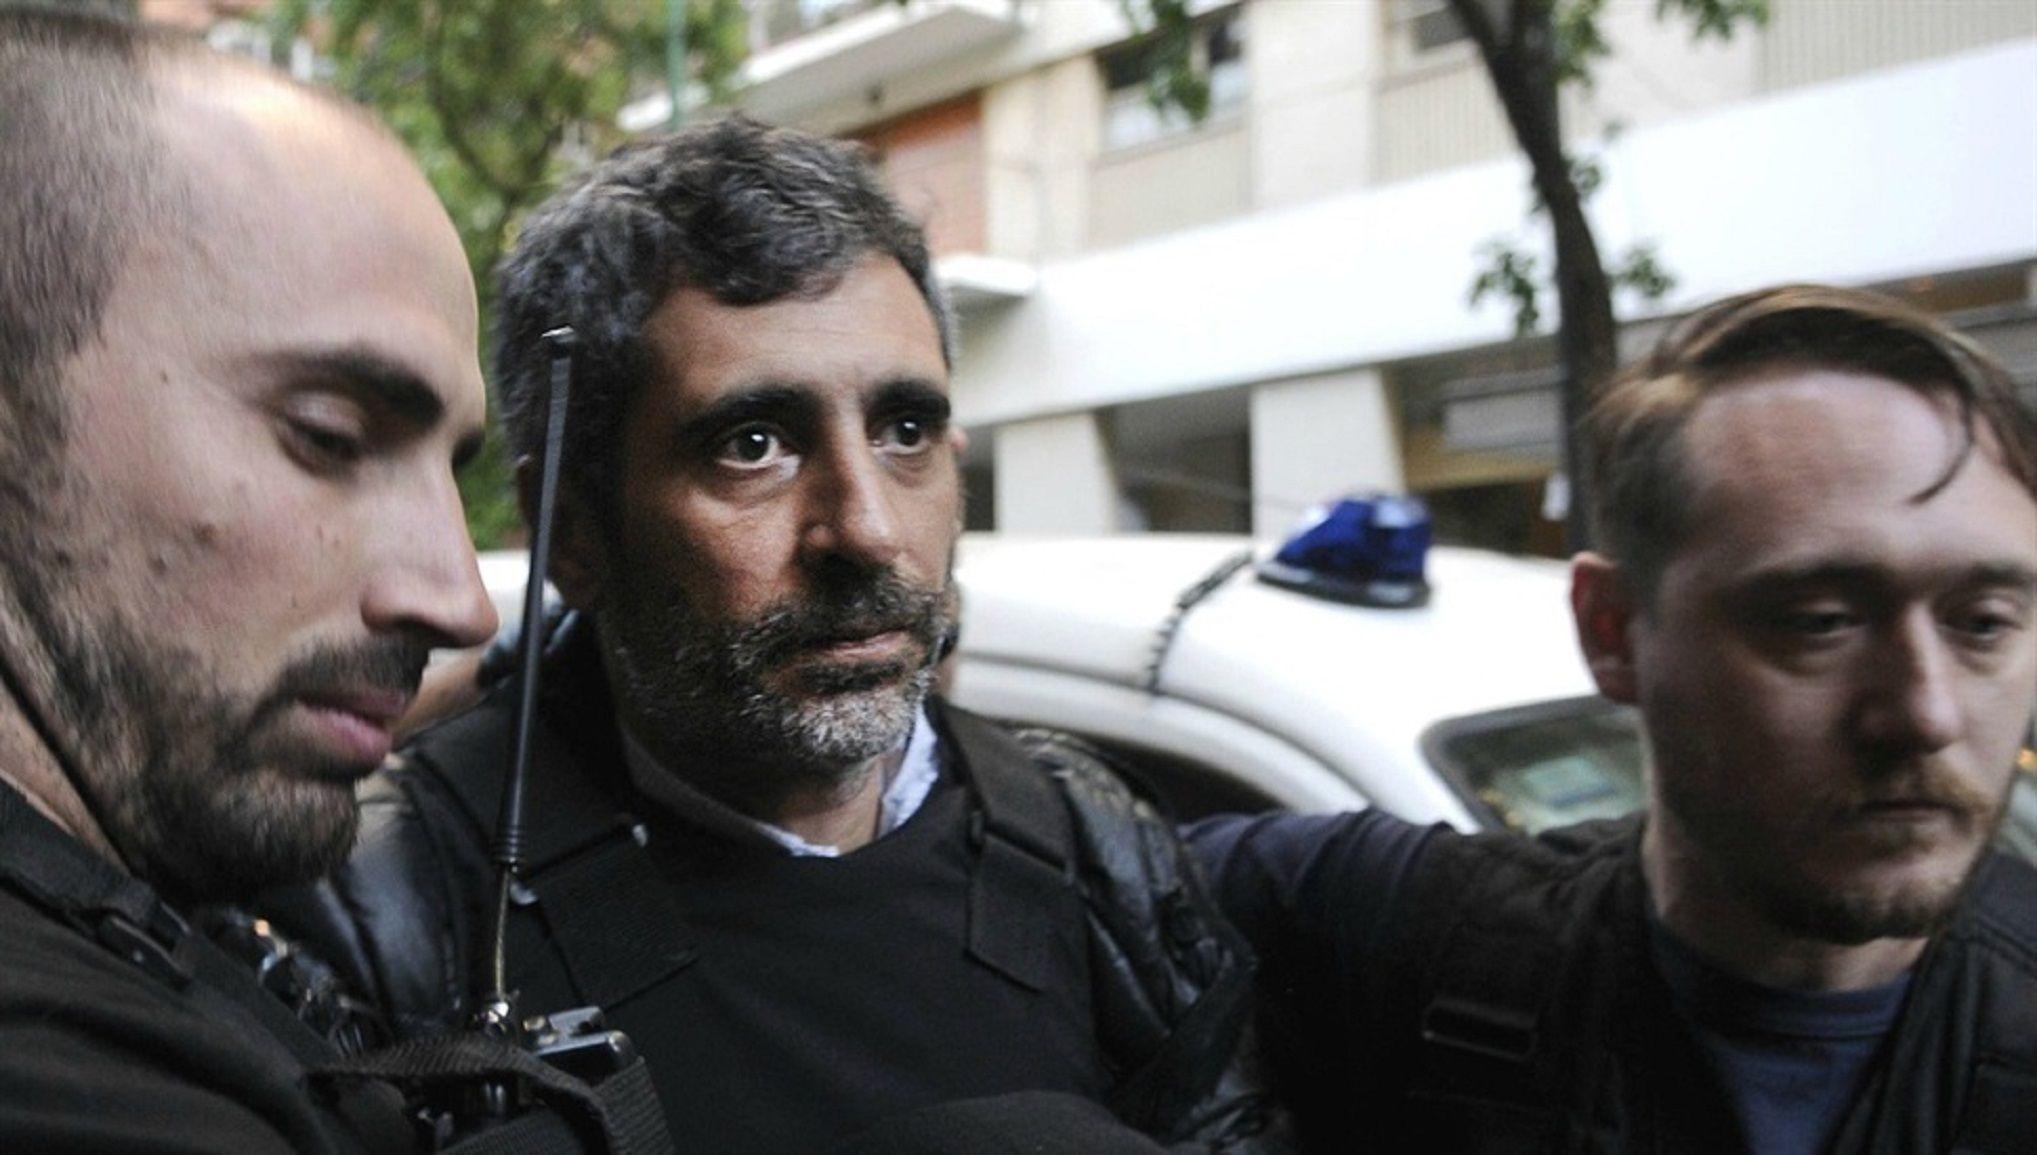 Megaoperativo: detuvieron a Roberto Baratta, ex mano derecha de De Vido